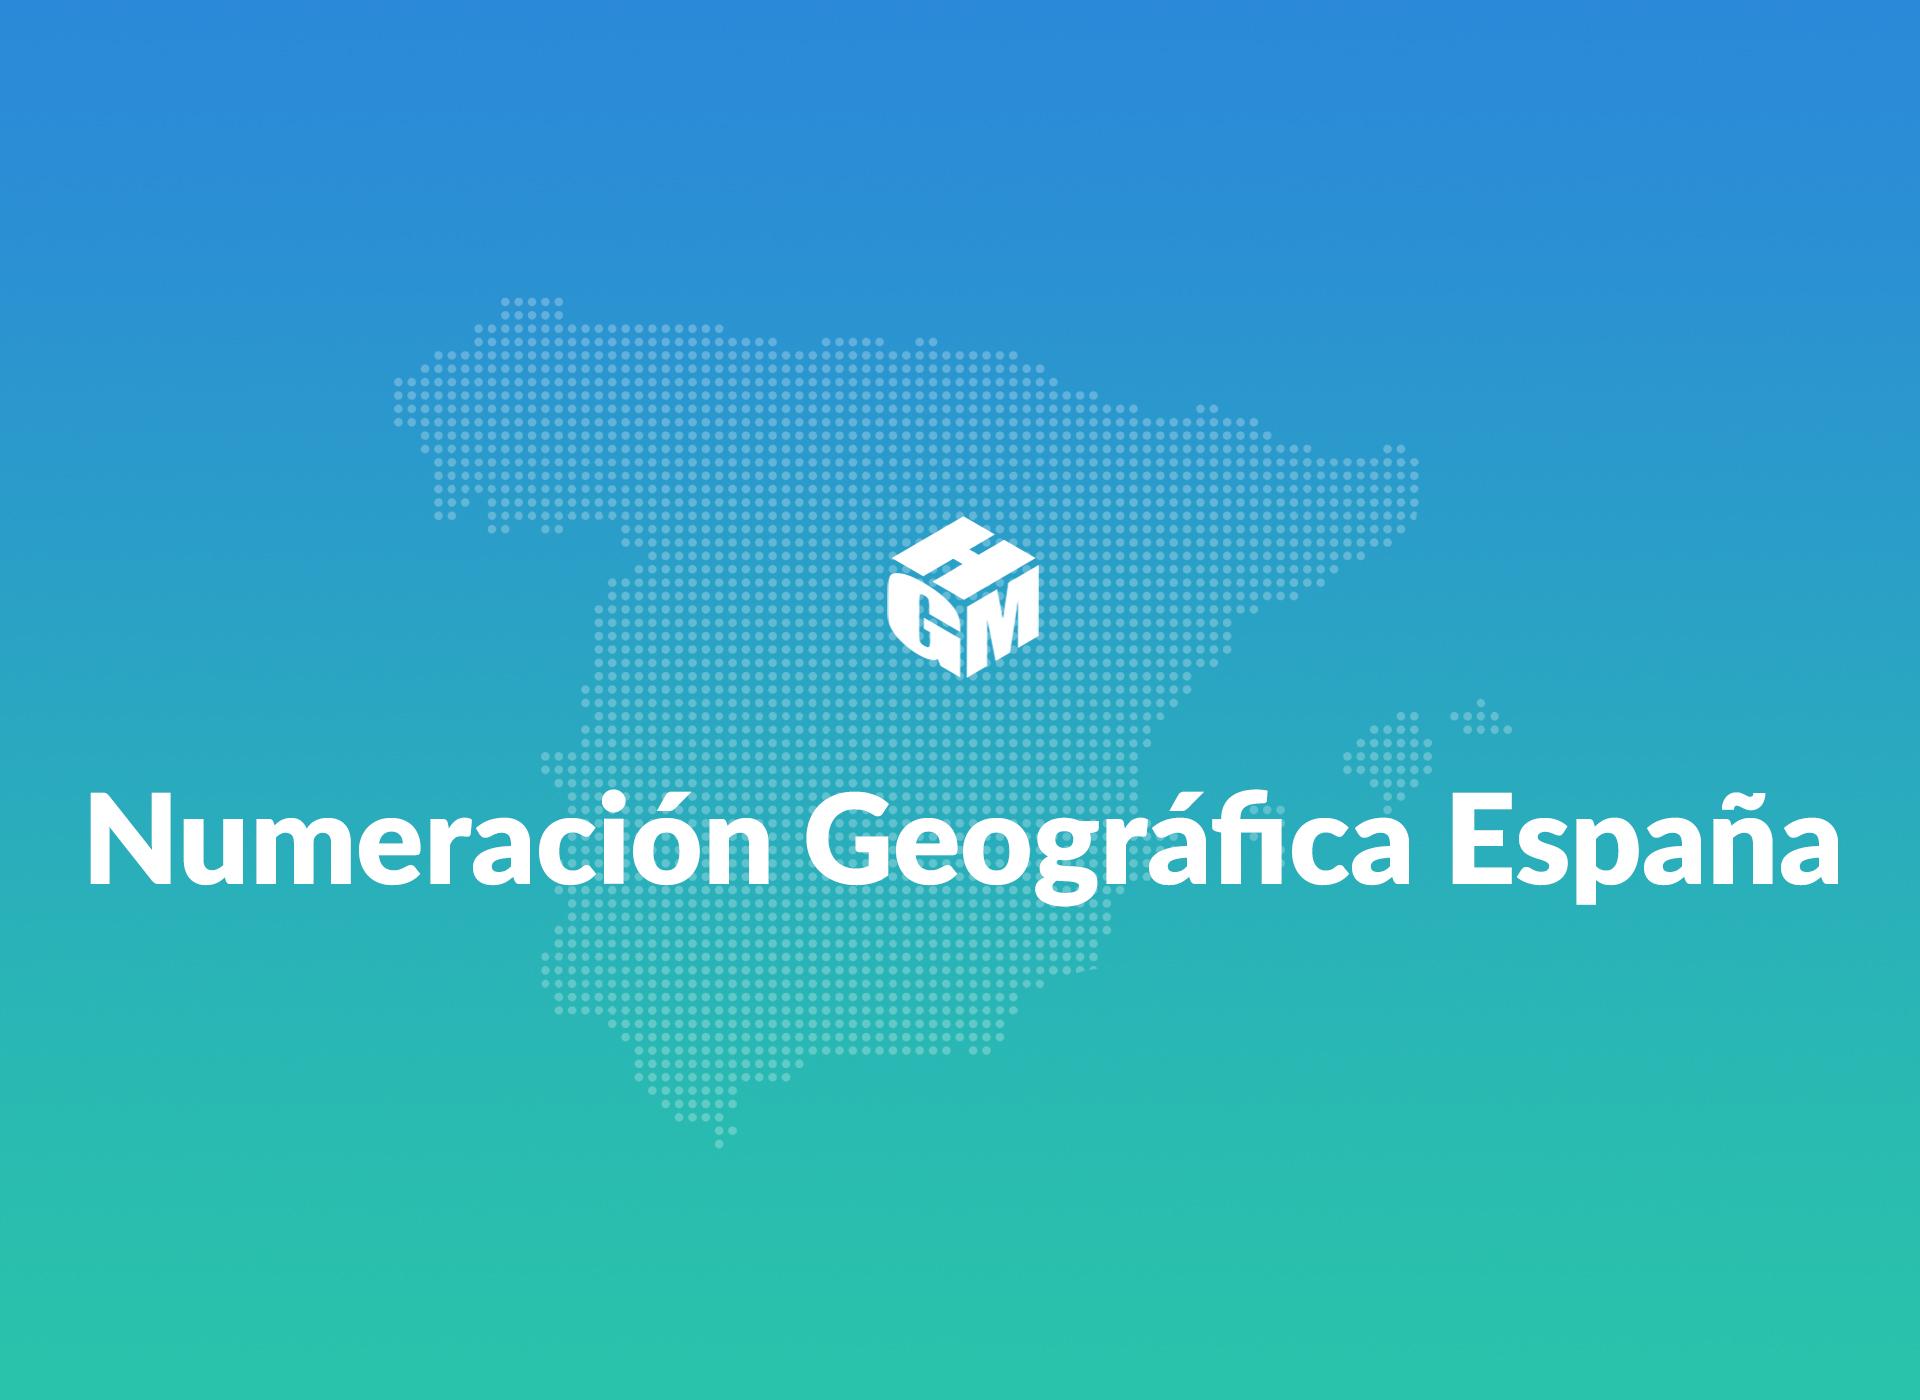 Numeración Geográfica de España